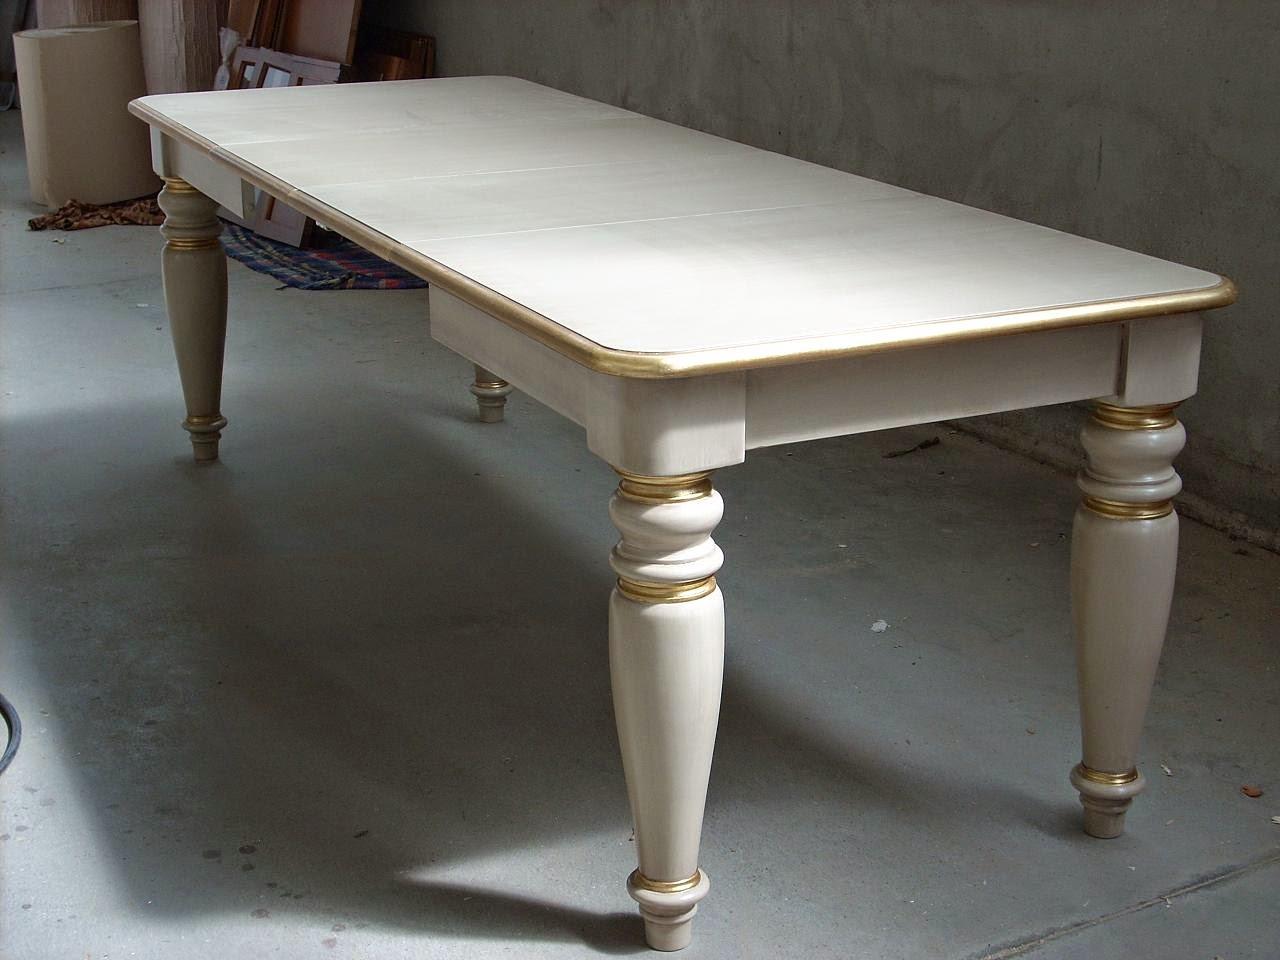 mobili su misura arredamenti su misura di qualit tavoli